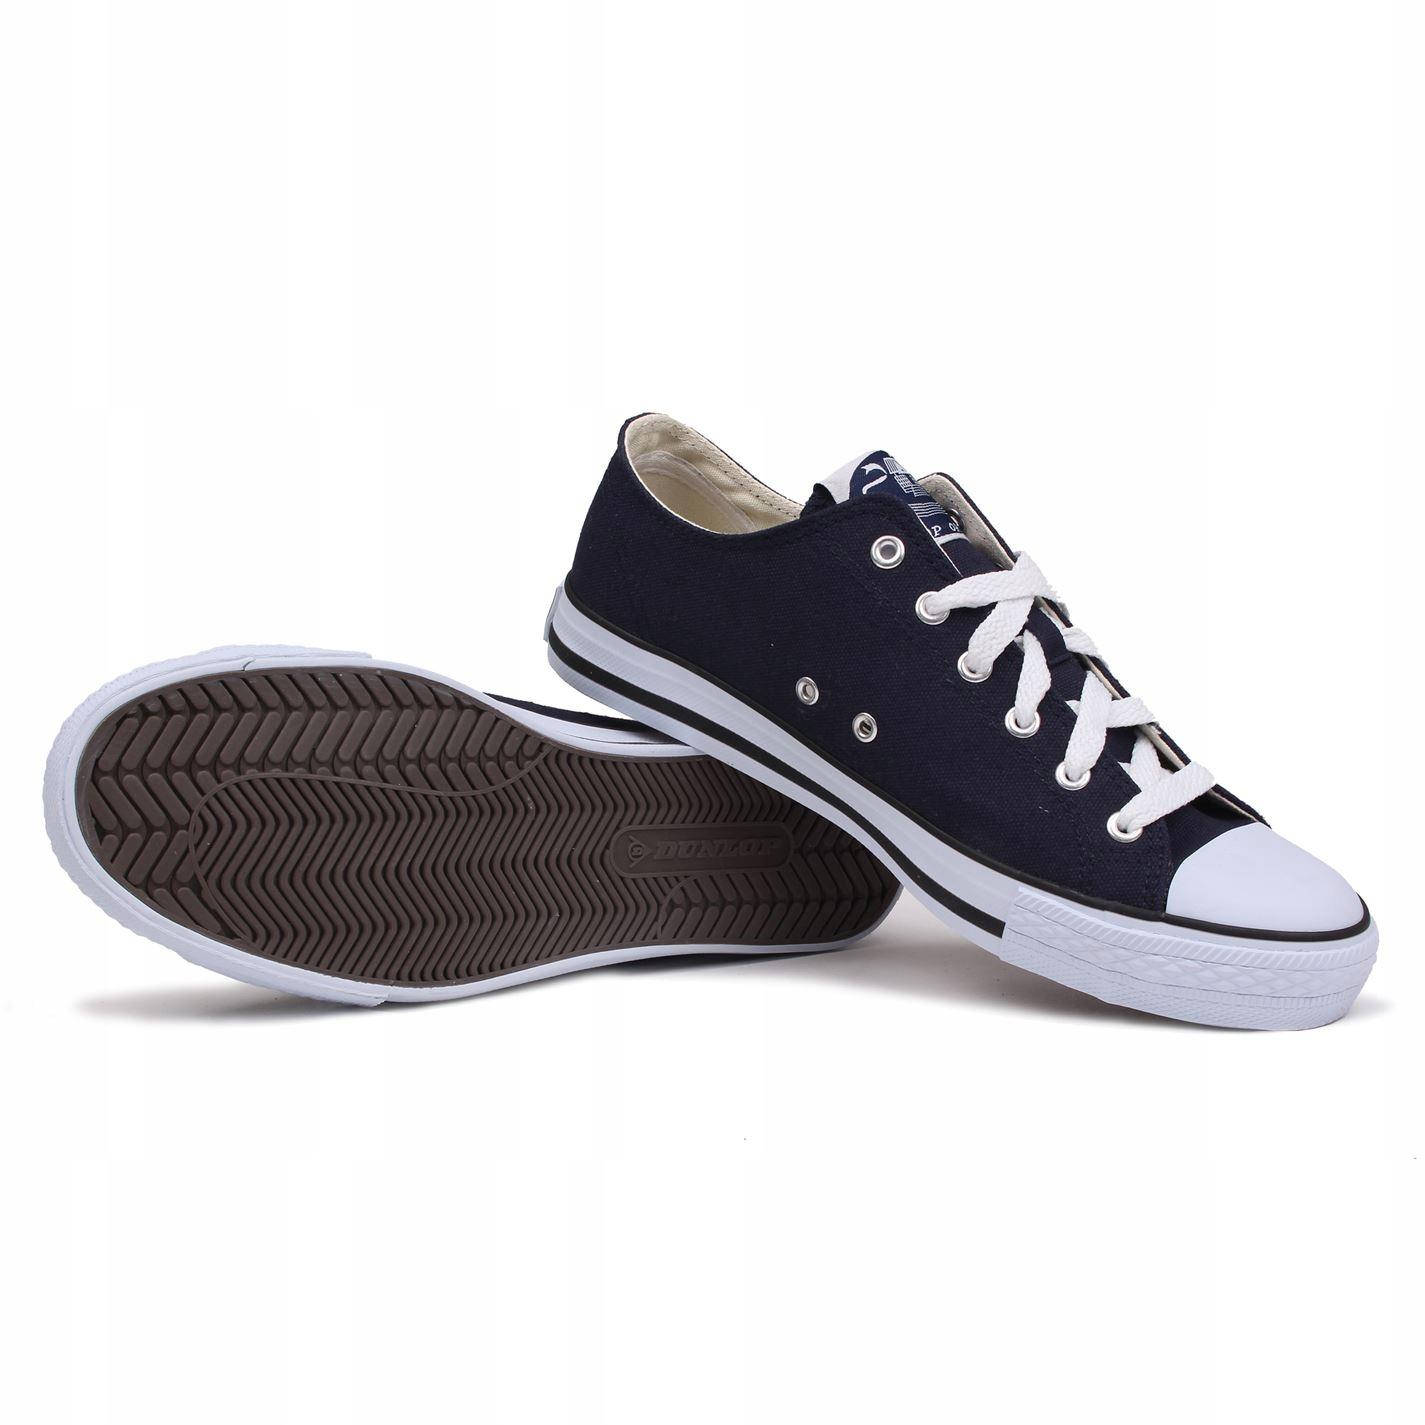 Trampki Dunlop markowe modne męskie niskie 42,5